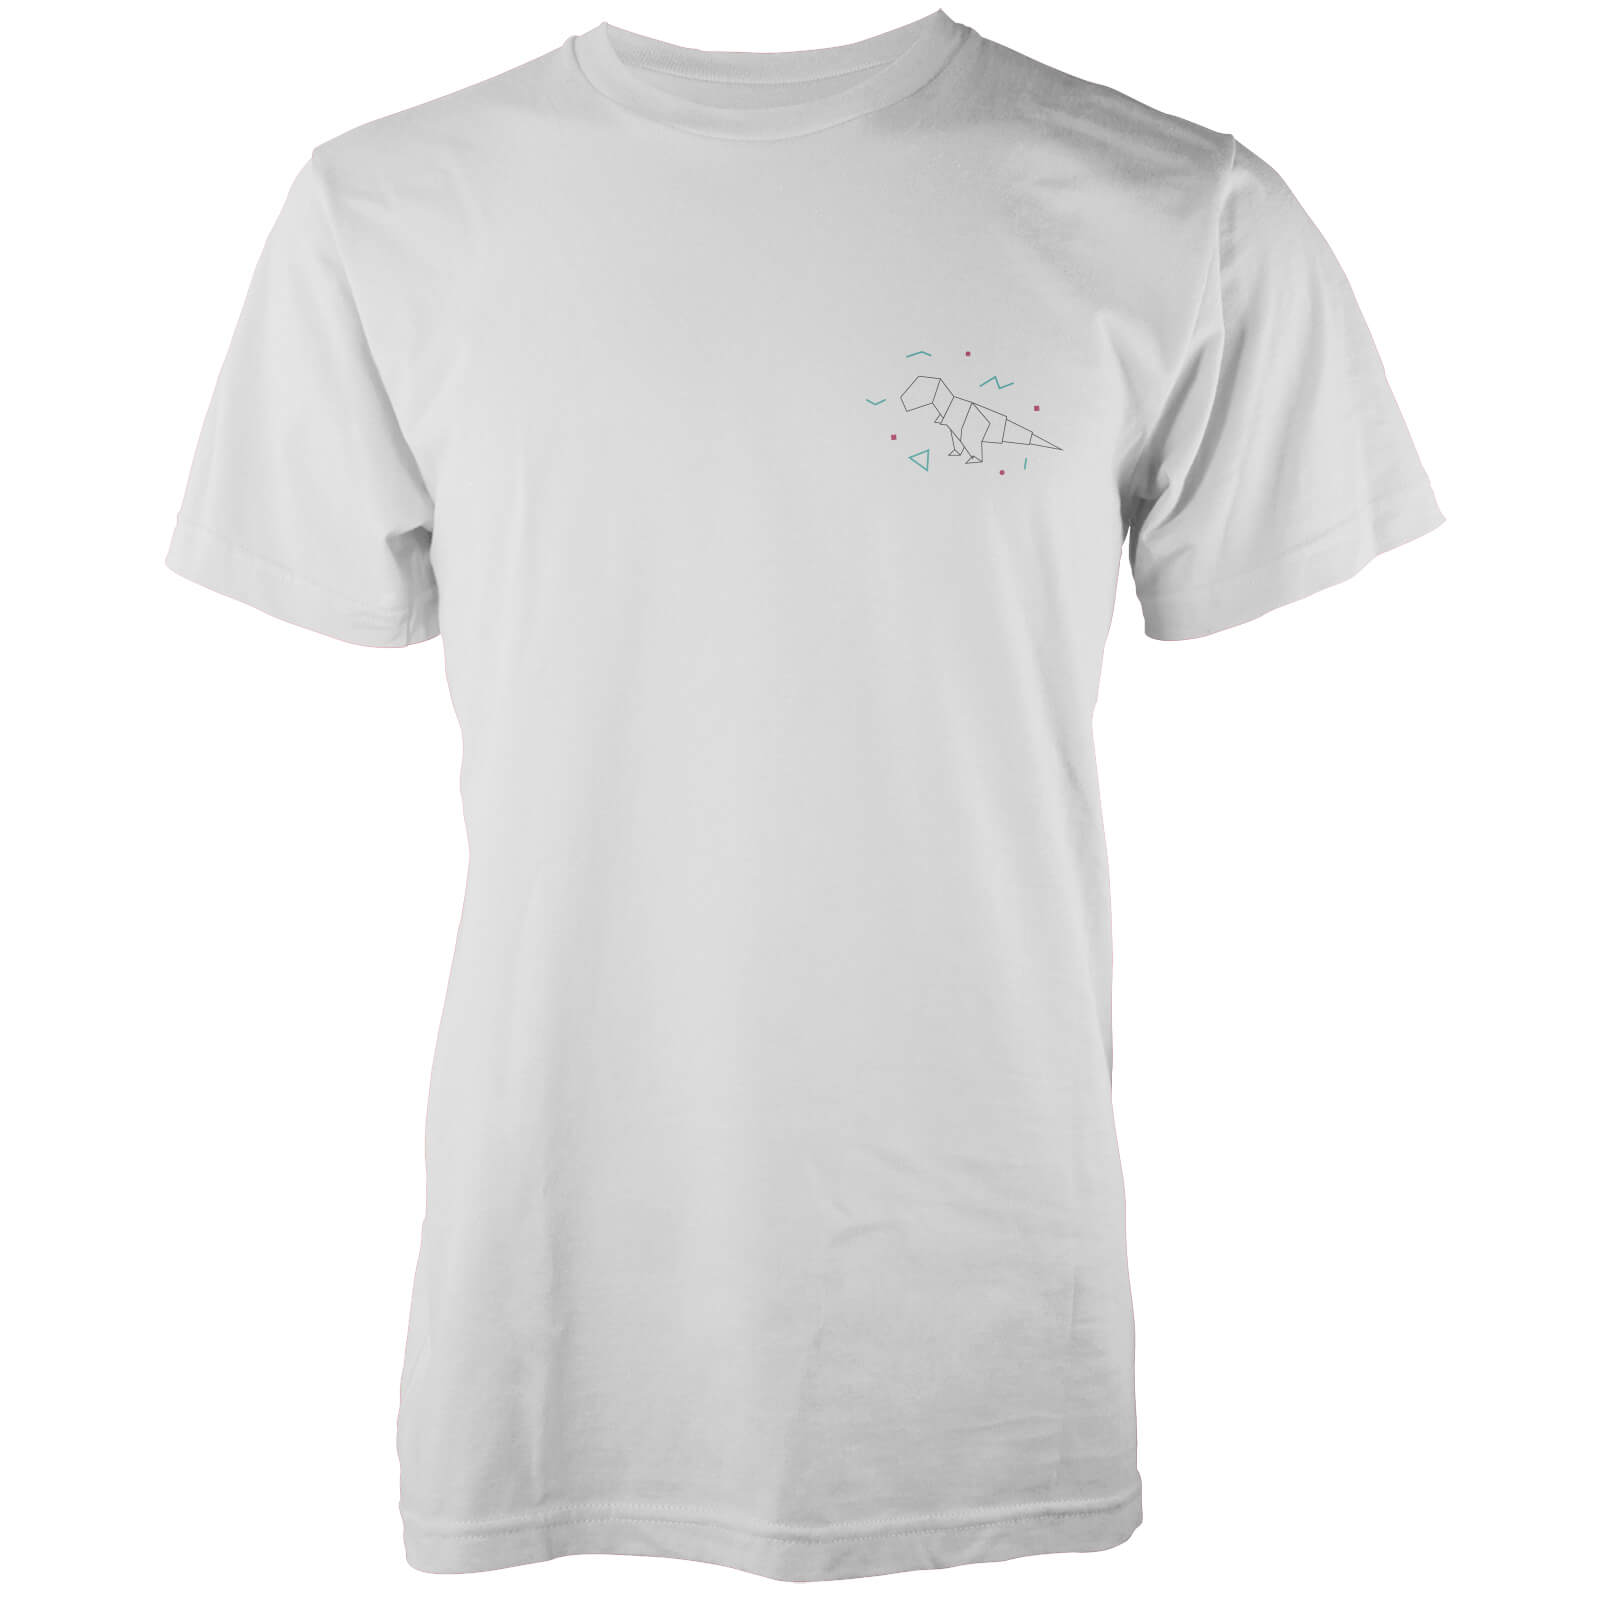 Origami Dinosaur Pocket Print T-Rex White T-Shirt | IWOOT - photo#46